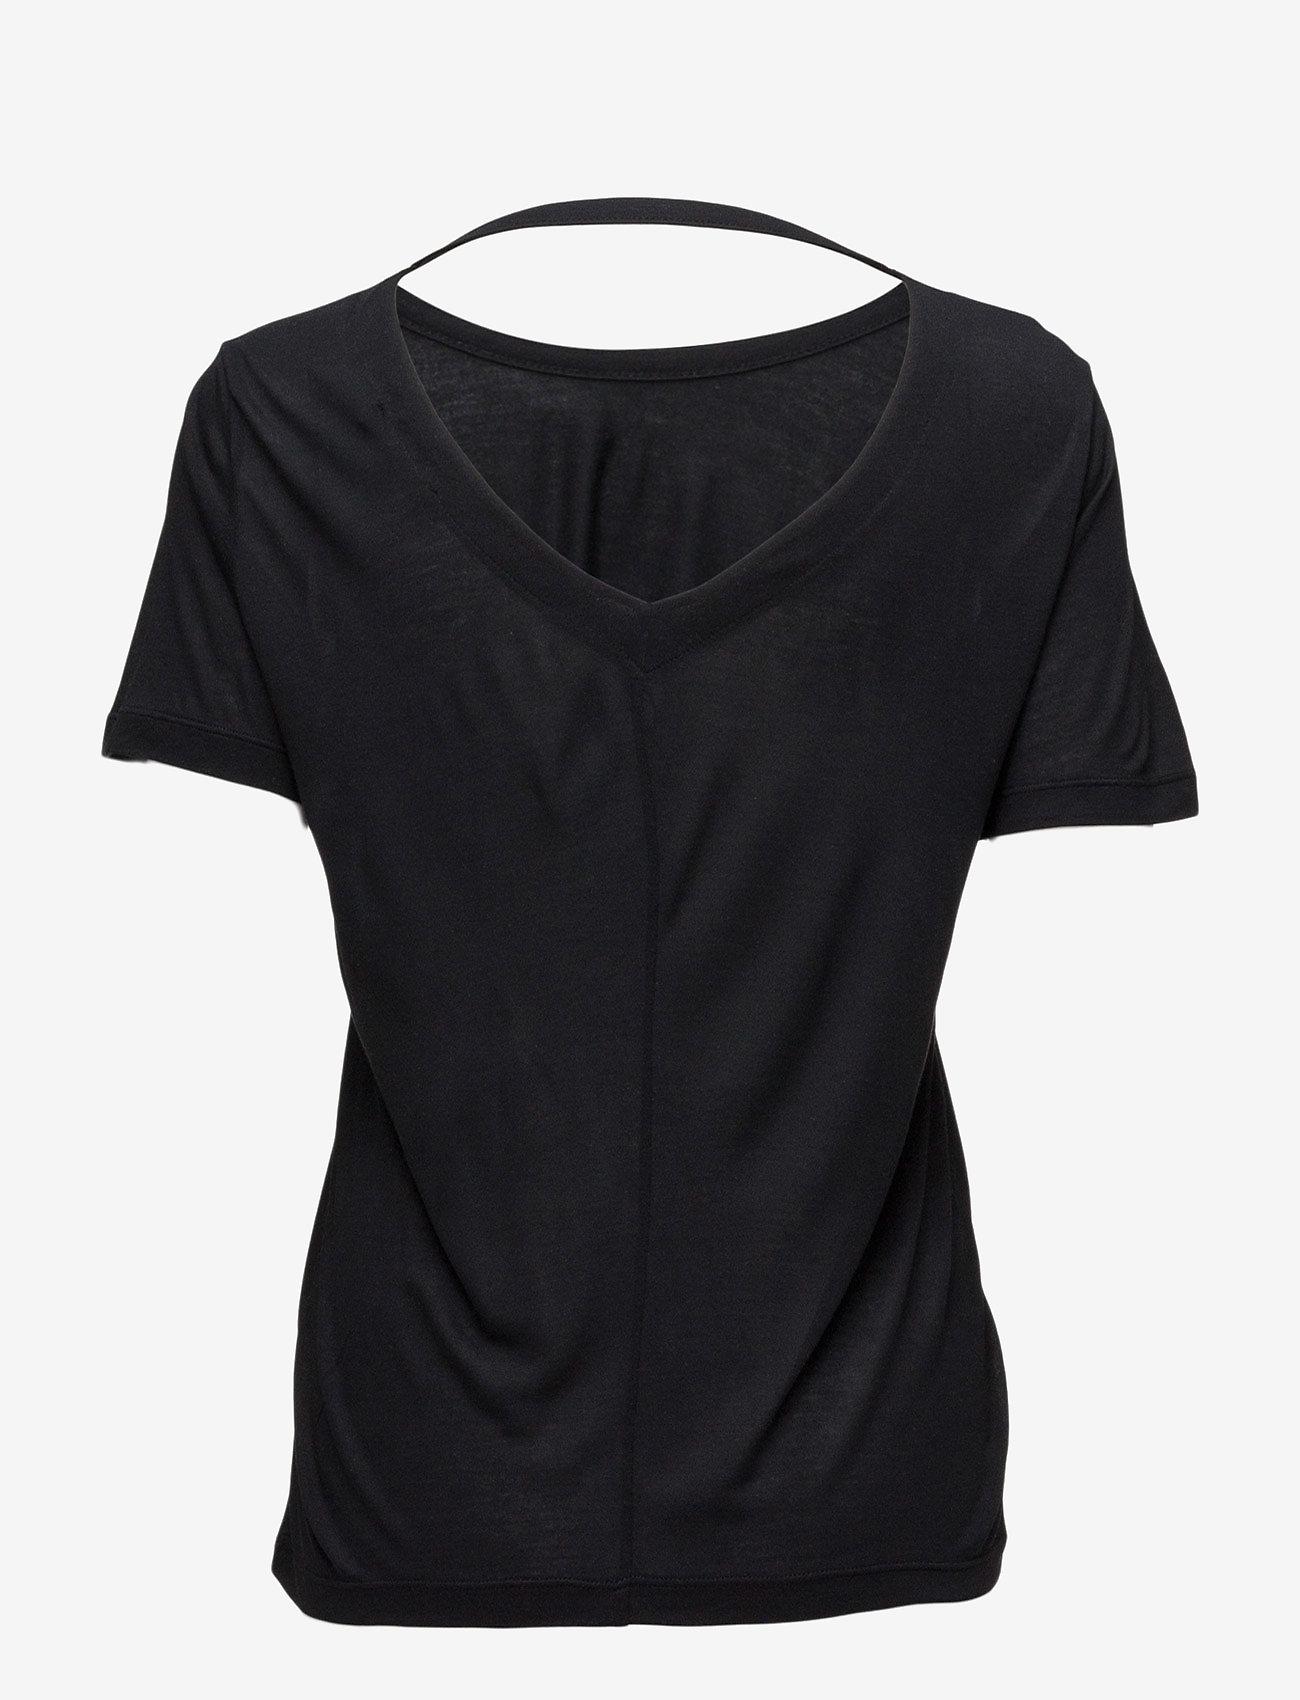 Whyred - FONDA - basic t-shirts - black